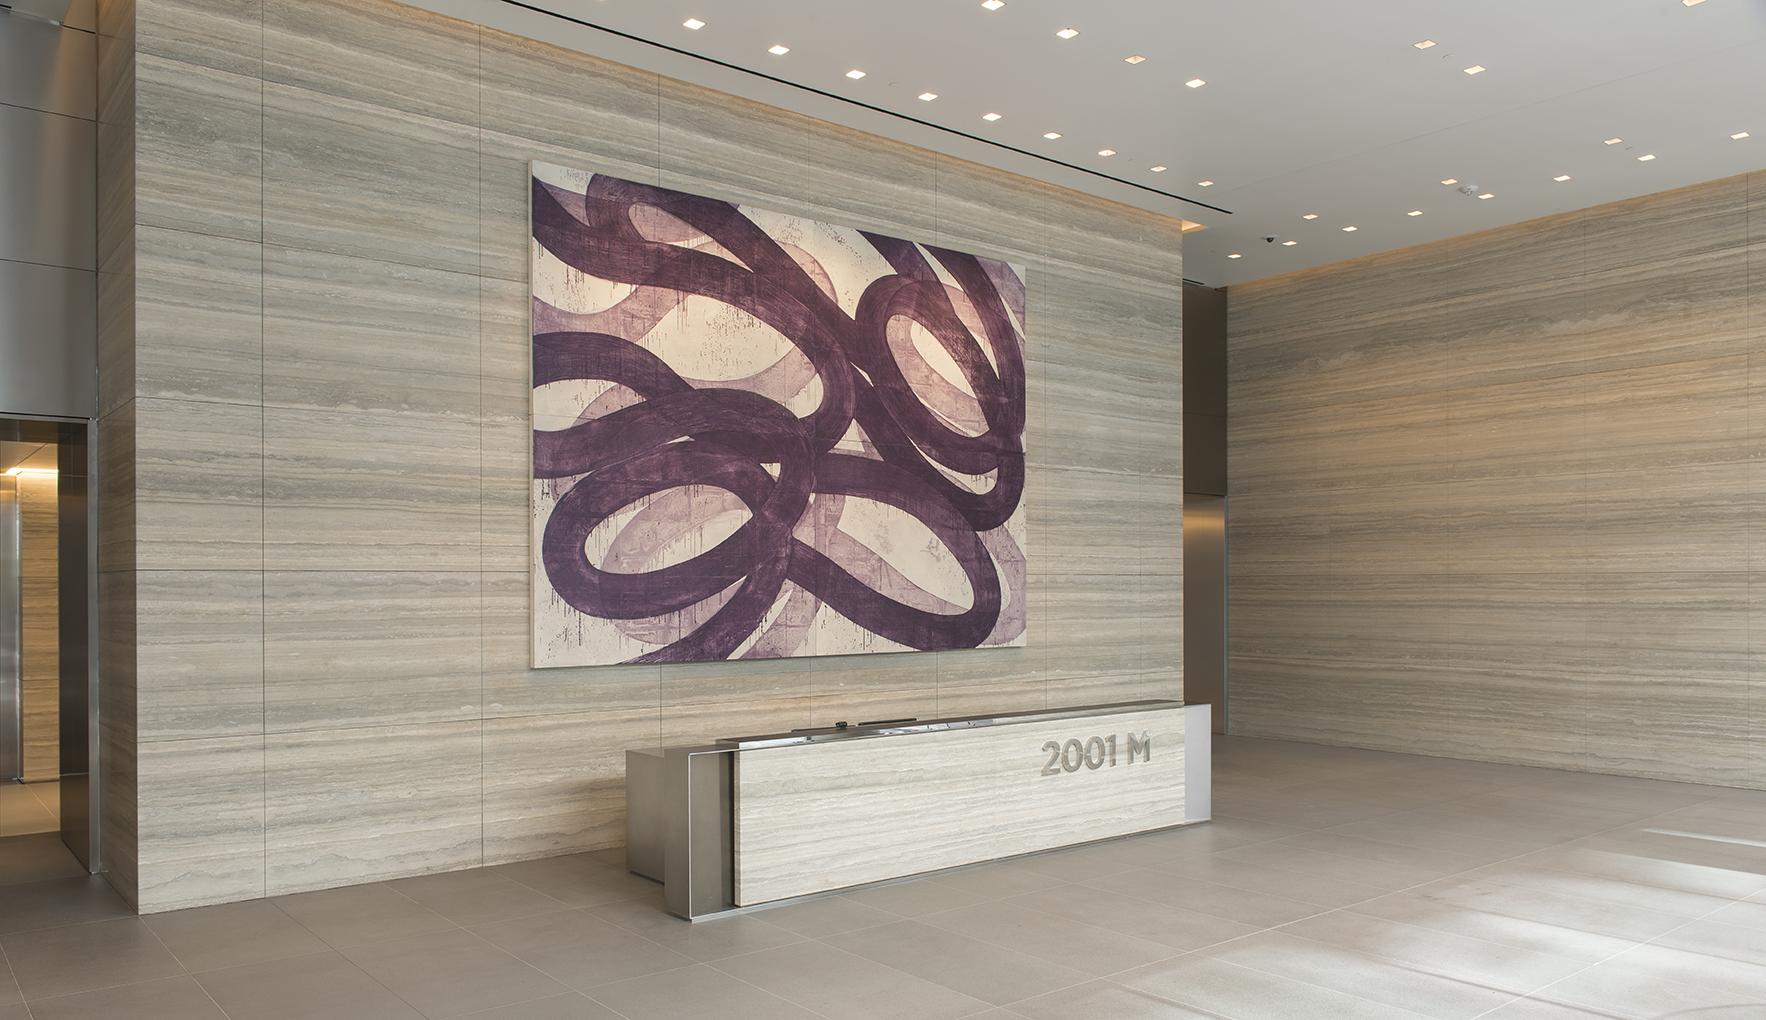 A lobby in an office building